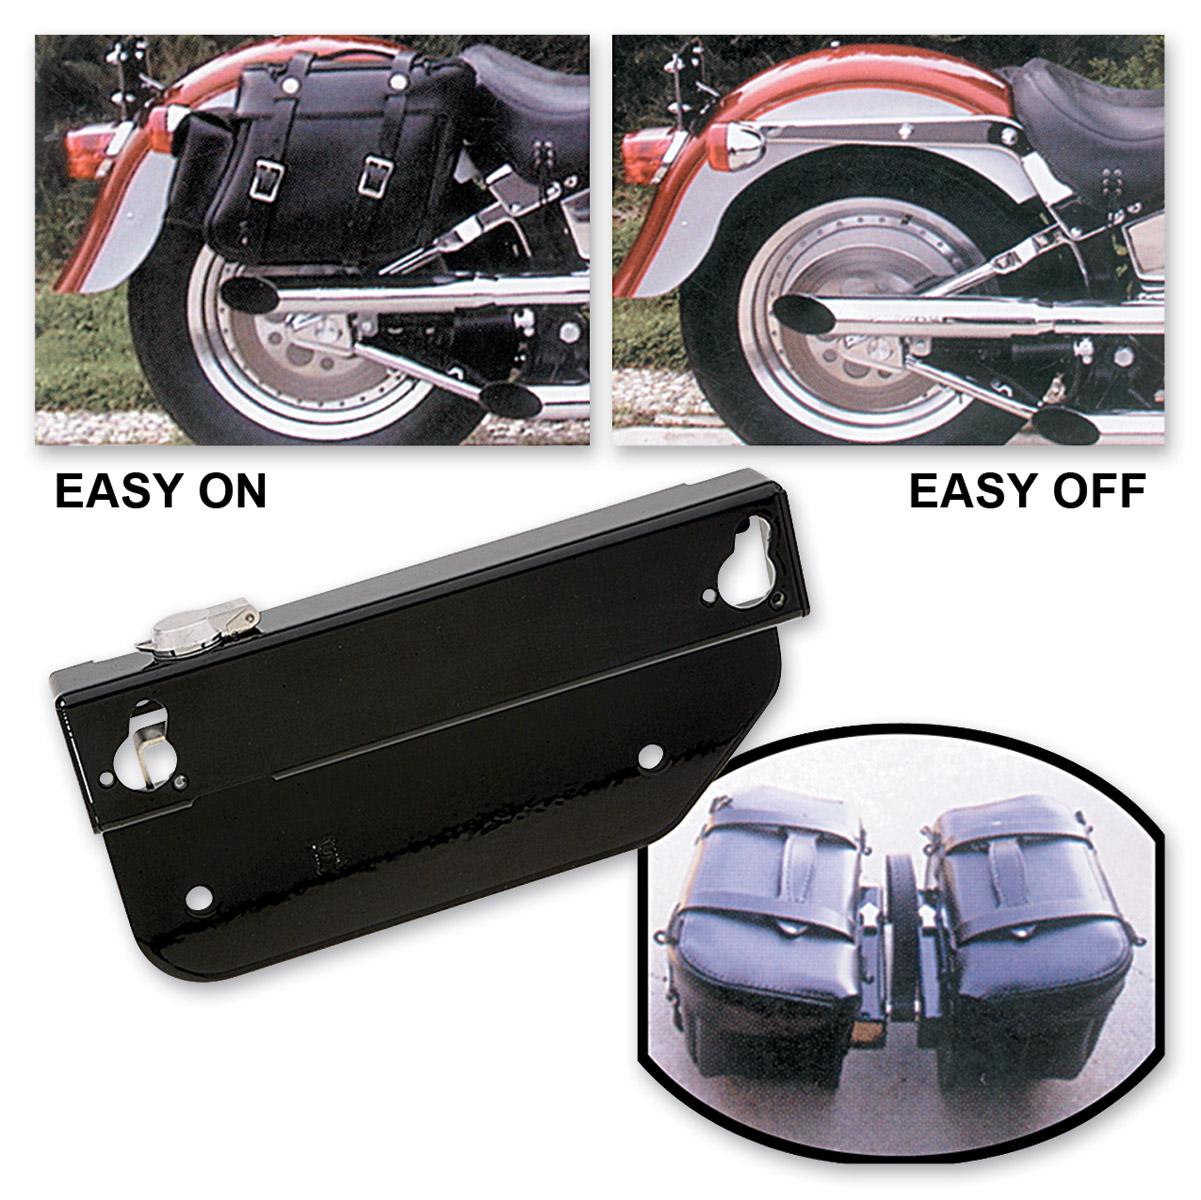 OEM backrest Easy Brackets for Honda Shadow AERO 750 w